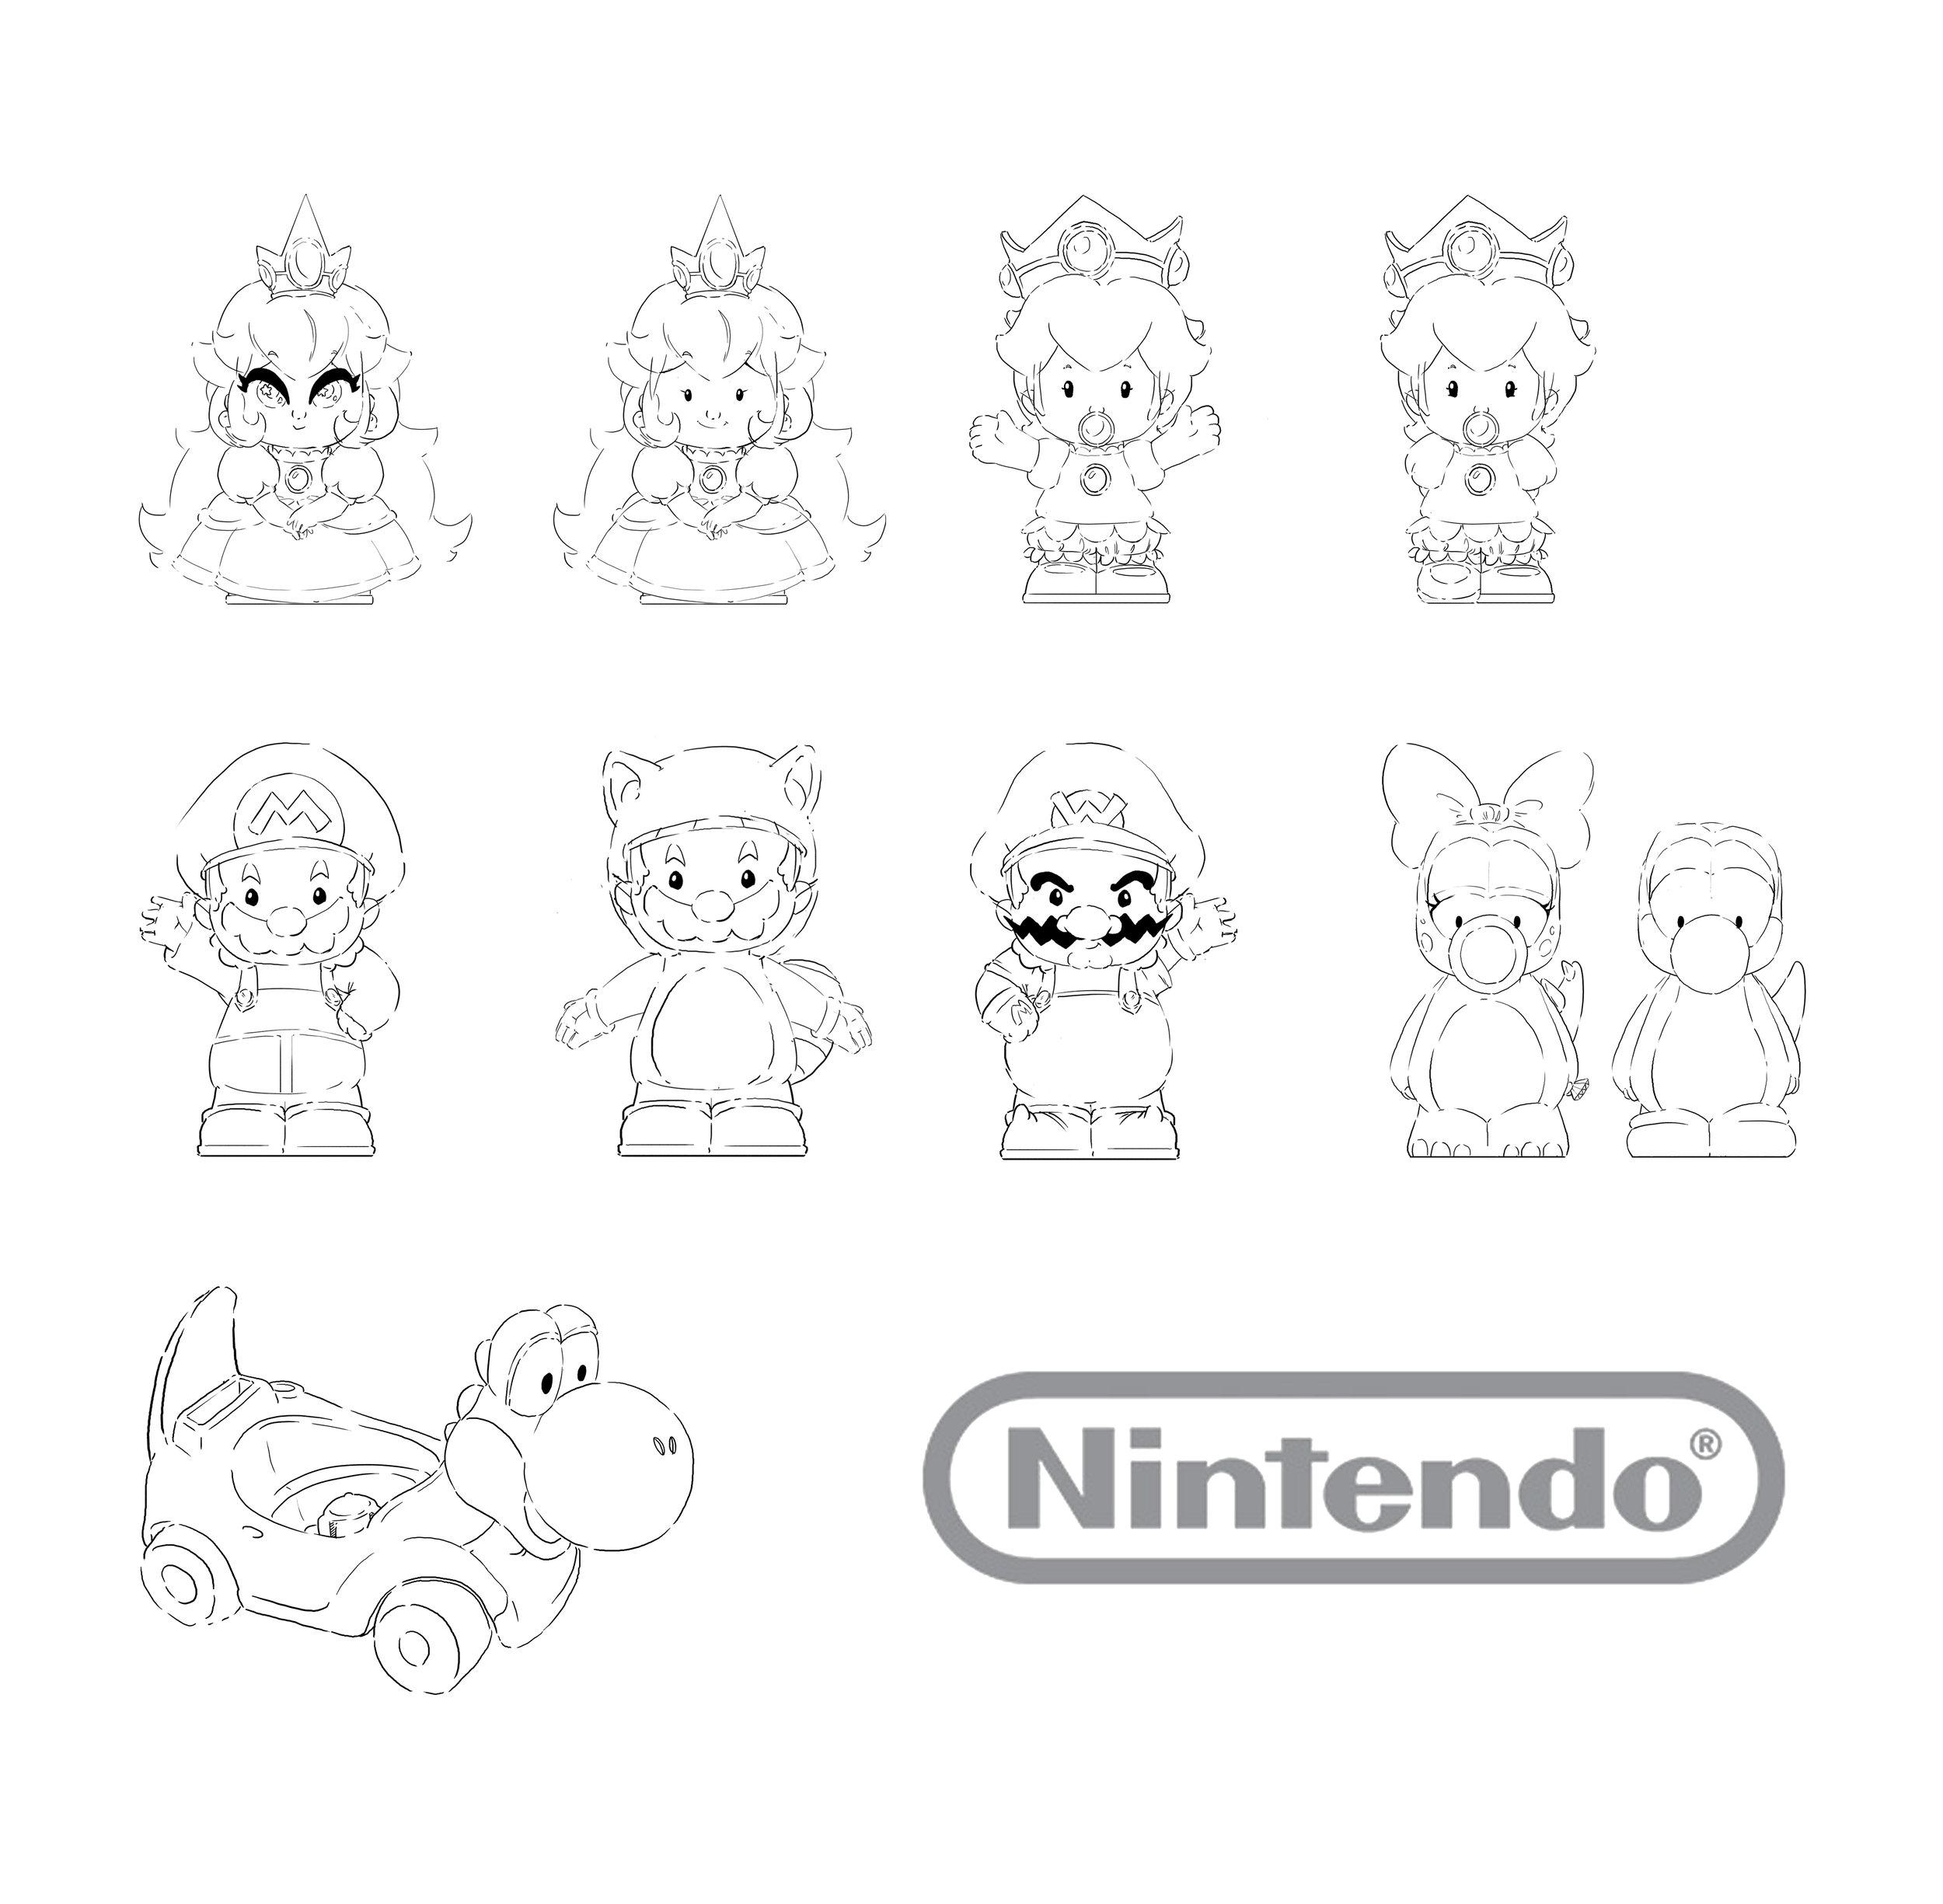 Nintendo to scale.jpg